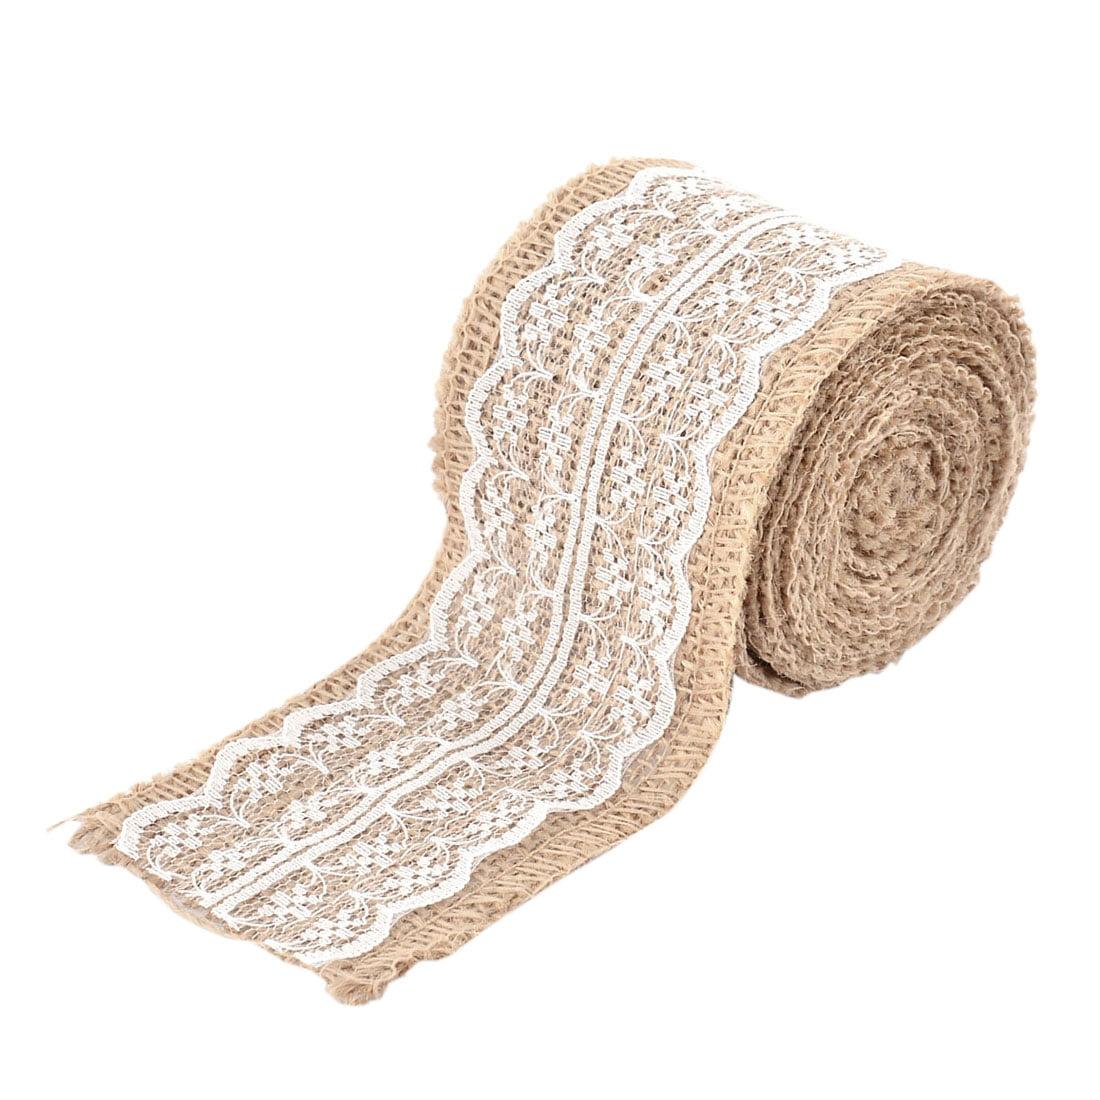 Room Festival Linen Diy Gift Decor Decoration Craft Burlap Ribbon